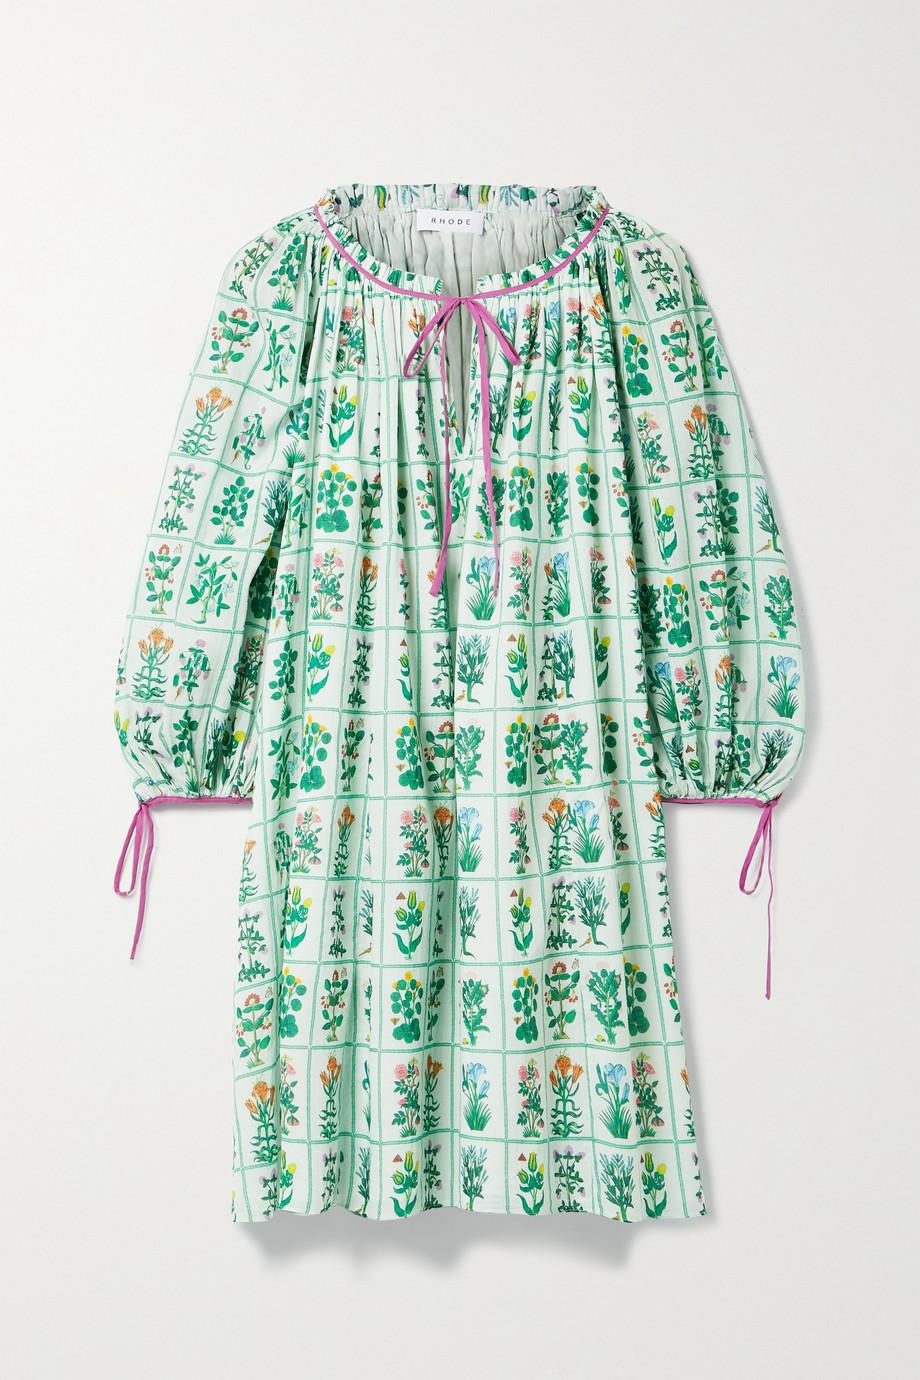 Rhode Sadie floral-print cotton-voile dress